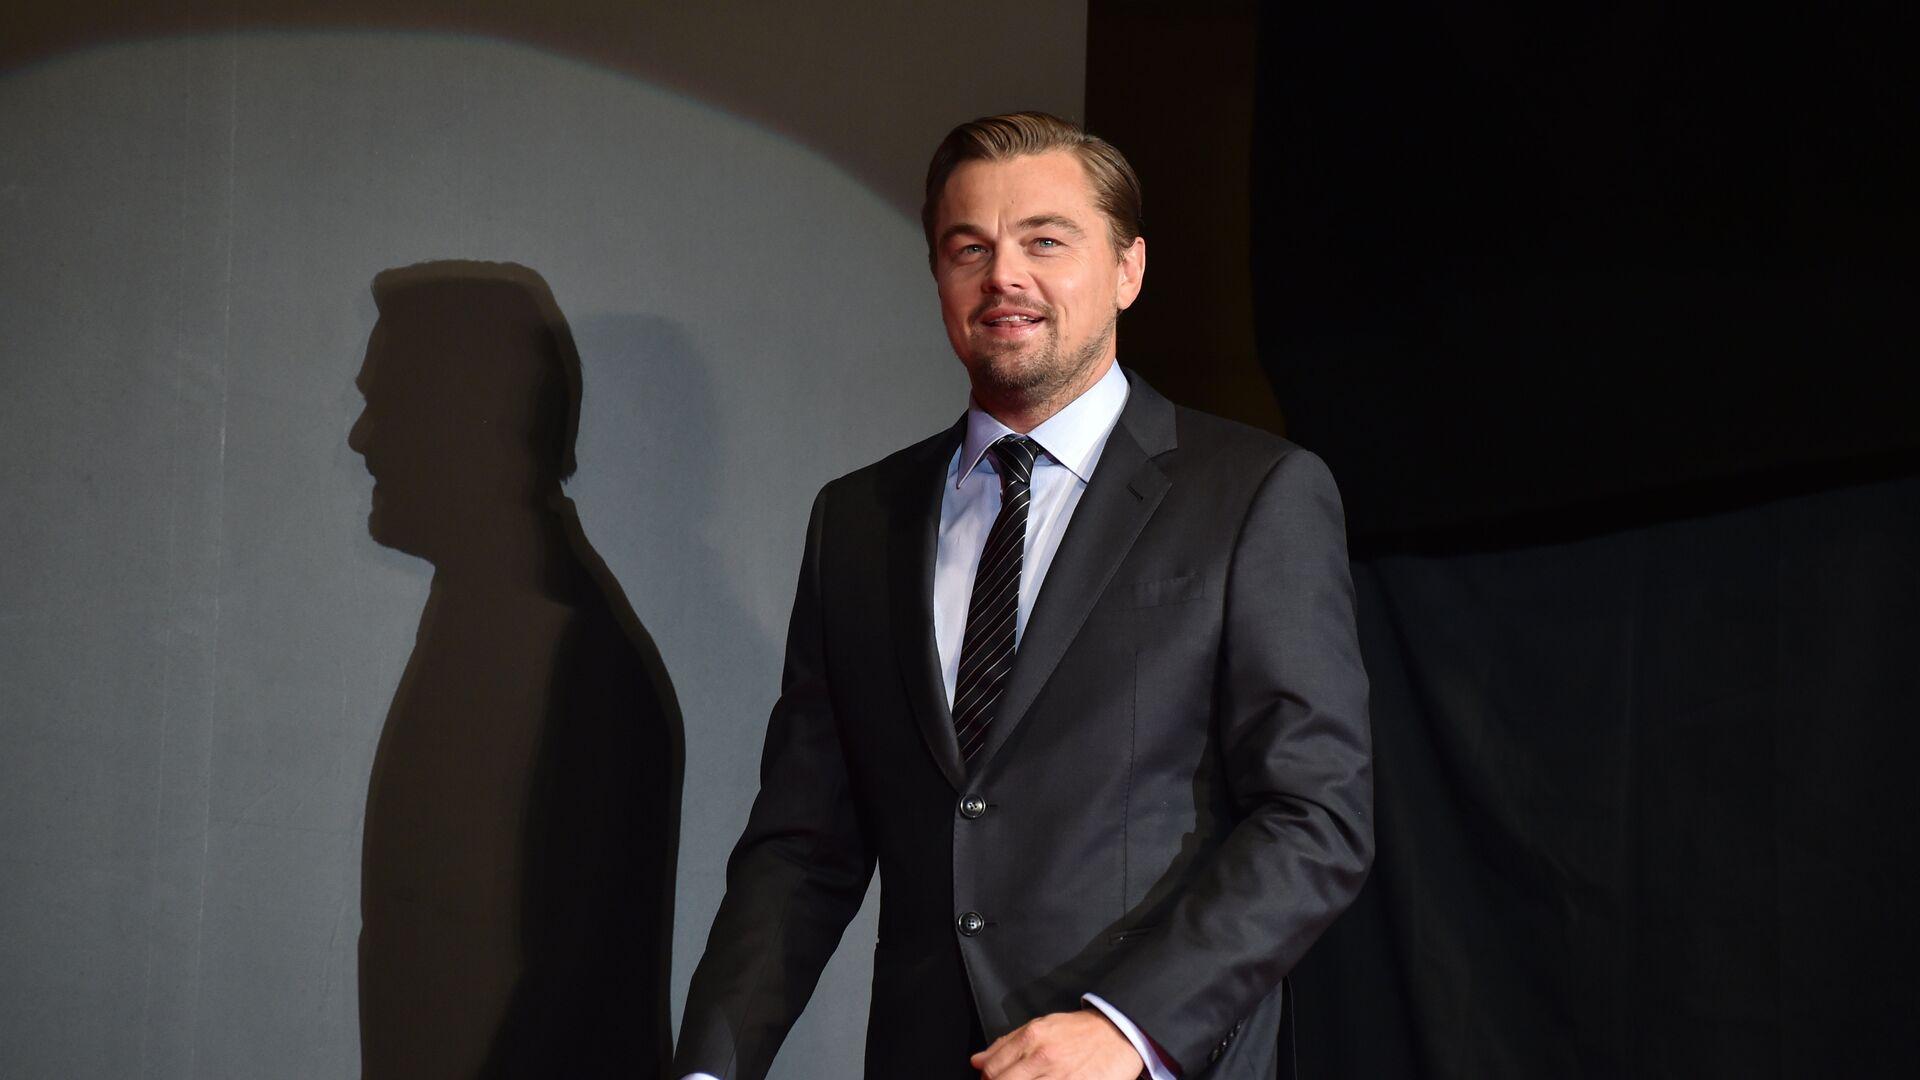 US actor Leonardo DiCaprio arrives for the Japanese premier for his new movie The Revenant in Tokyo on March 23, 2016.  - Sputnik Mundo, 1920, 18.05.2021